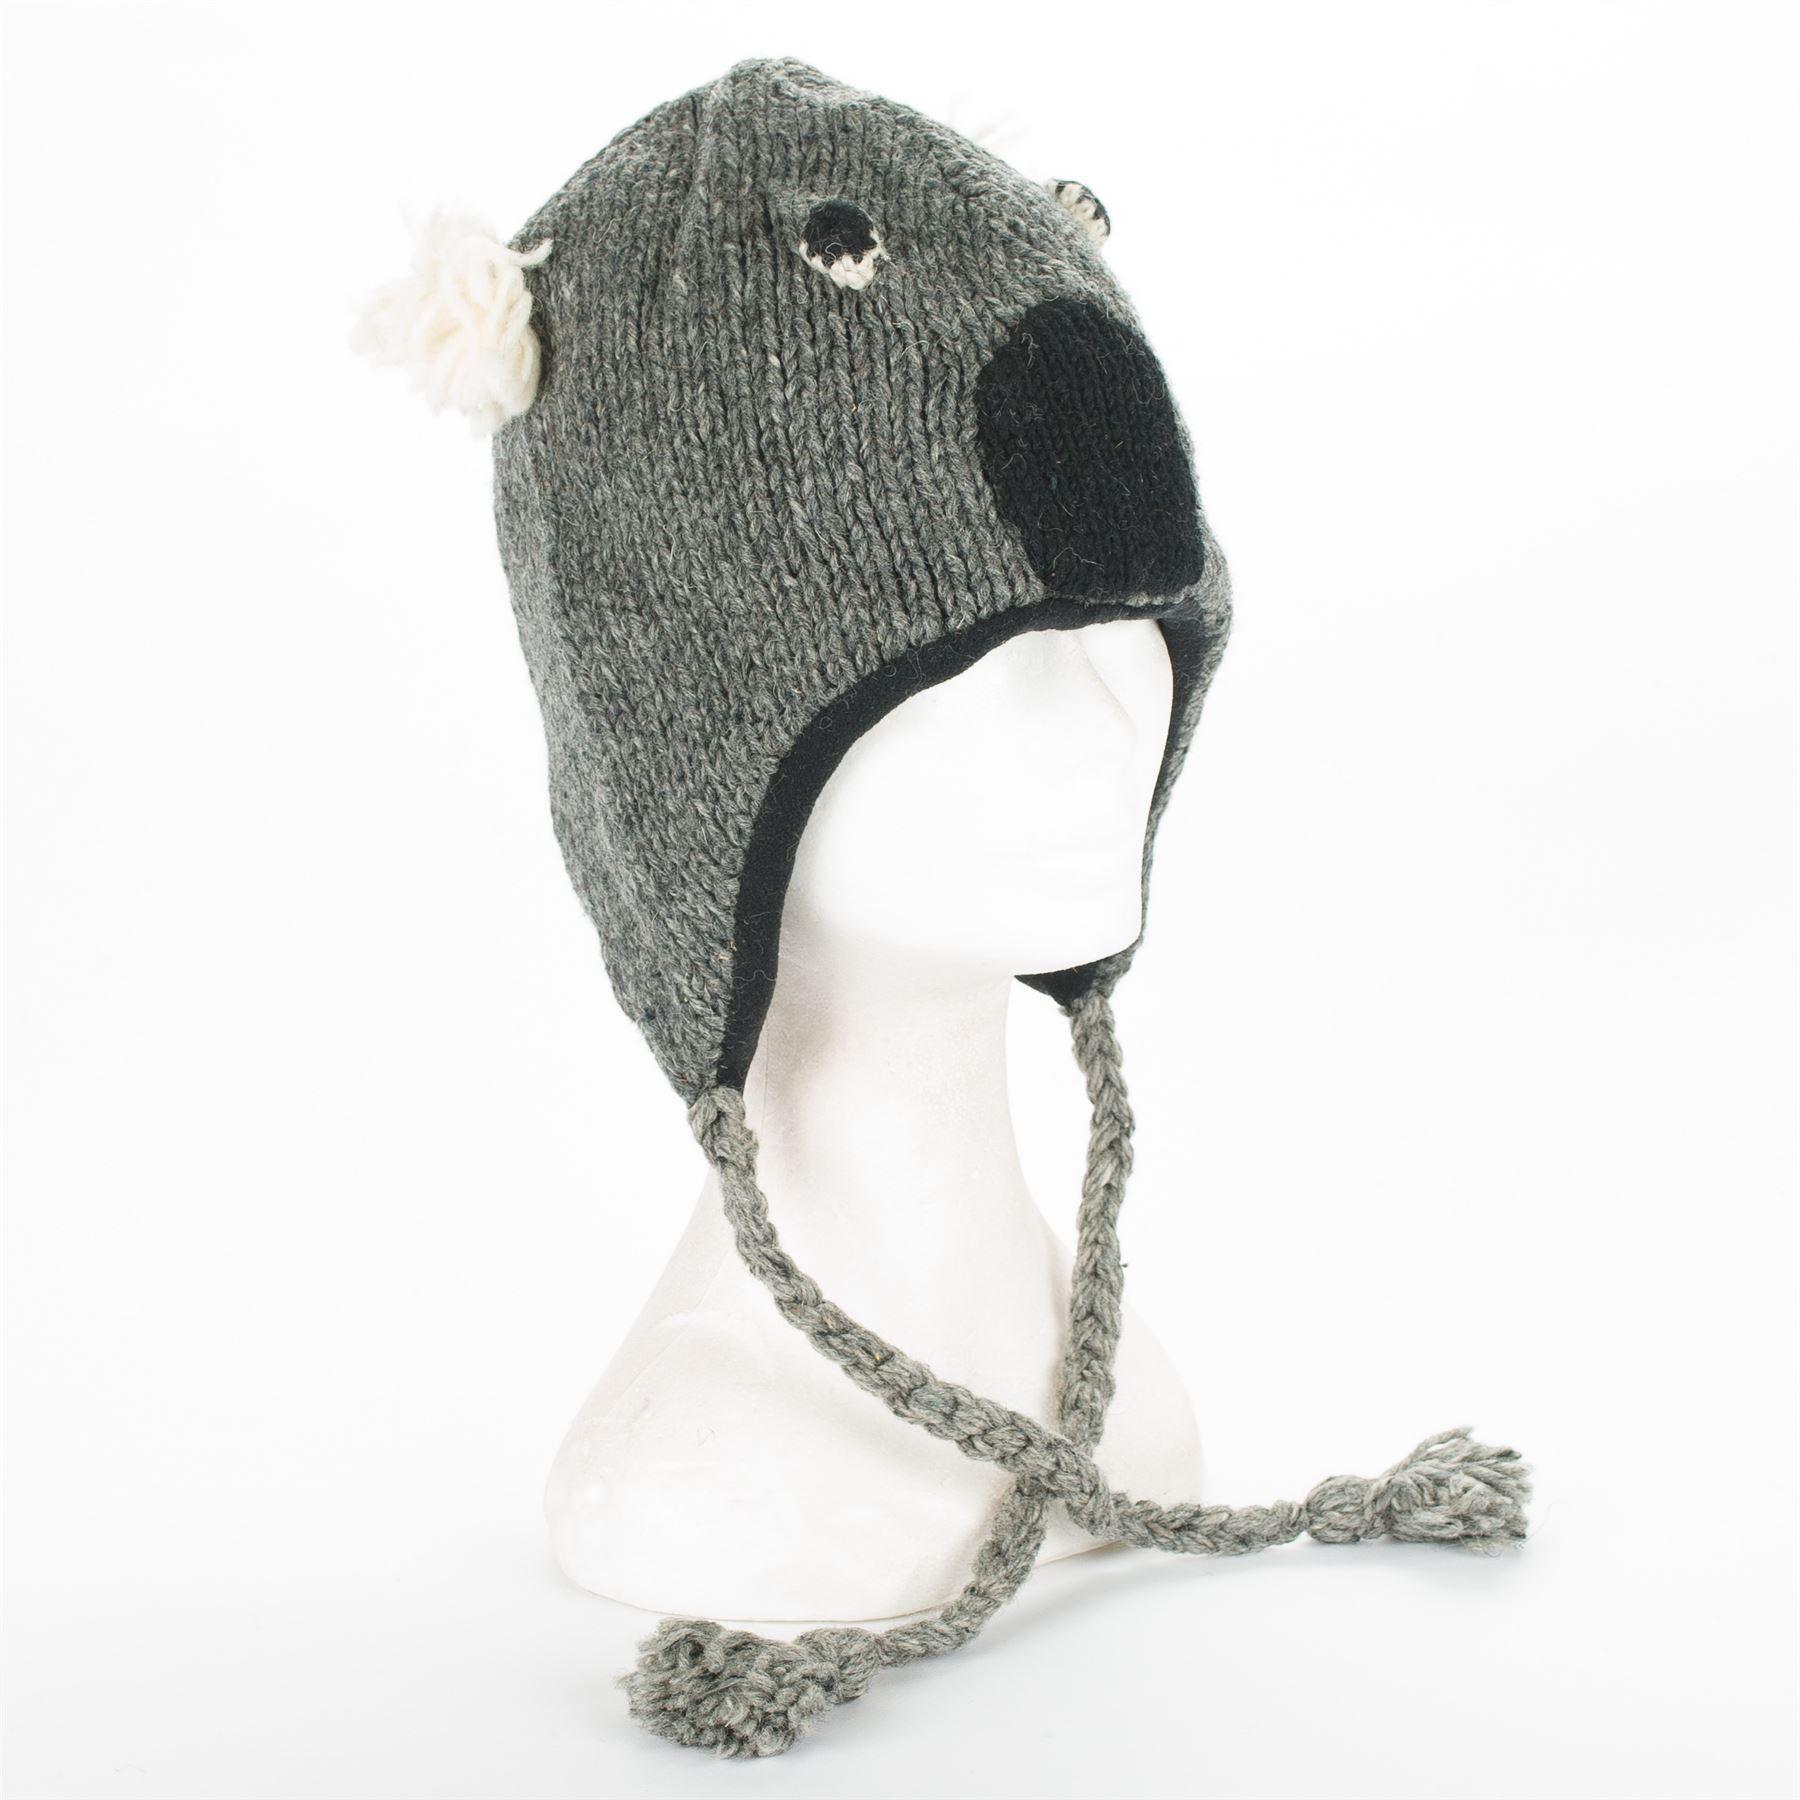 Handmade Knit 100 Wool Unisex Animal Winter Nepal Hat